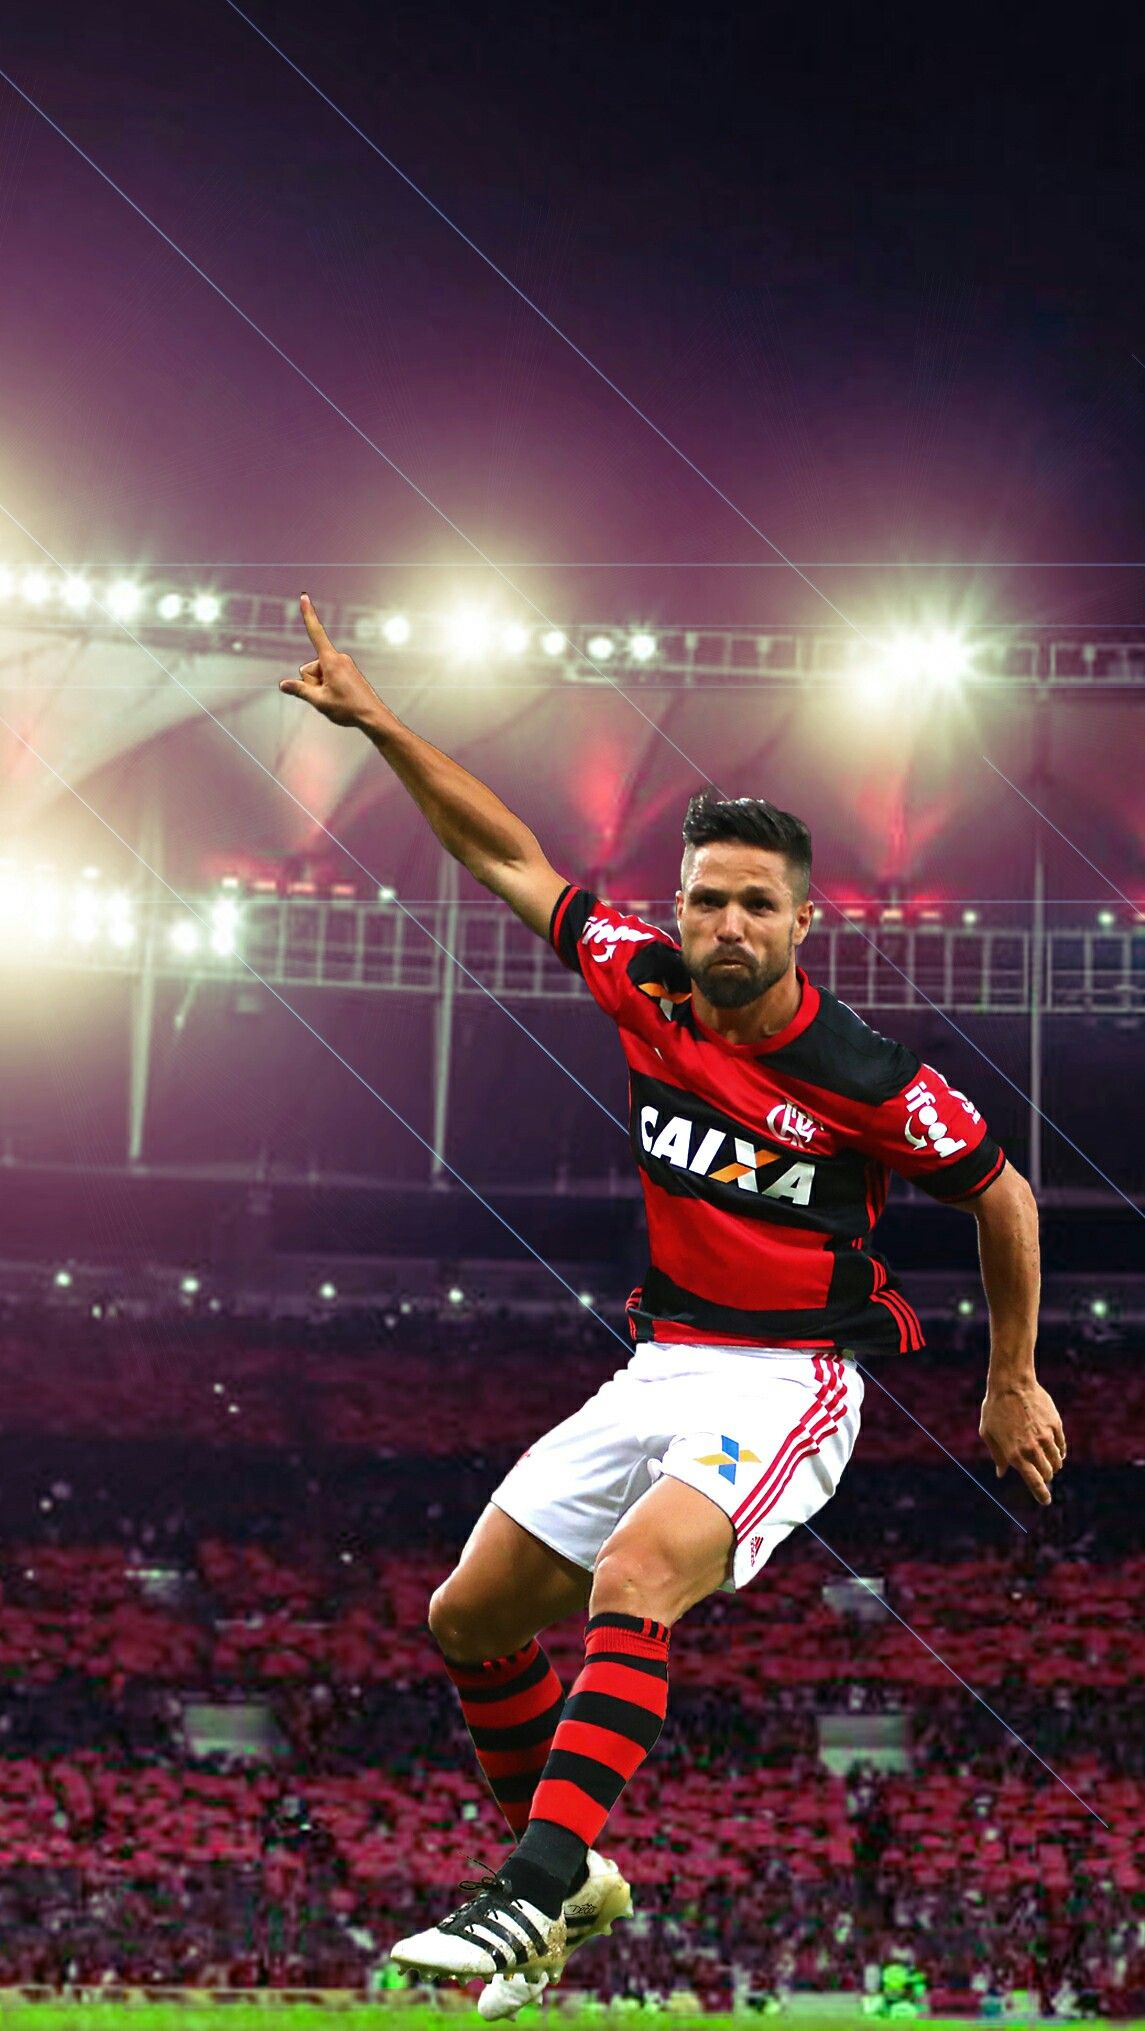 FlaDeco_ on Flamengo, Diego flamengo e Flamengo wallpaper